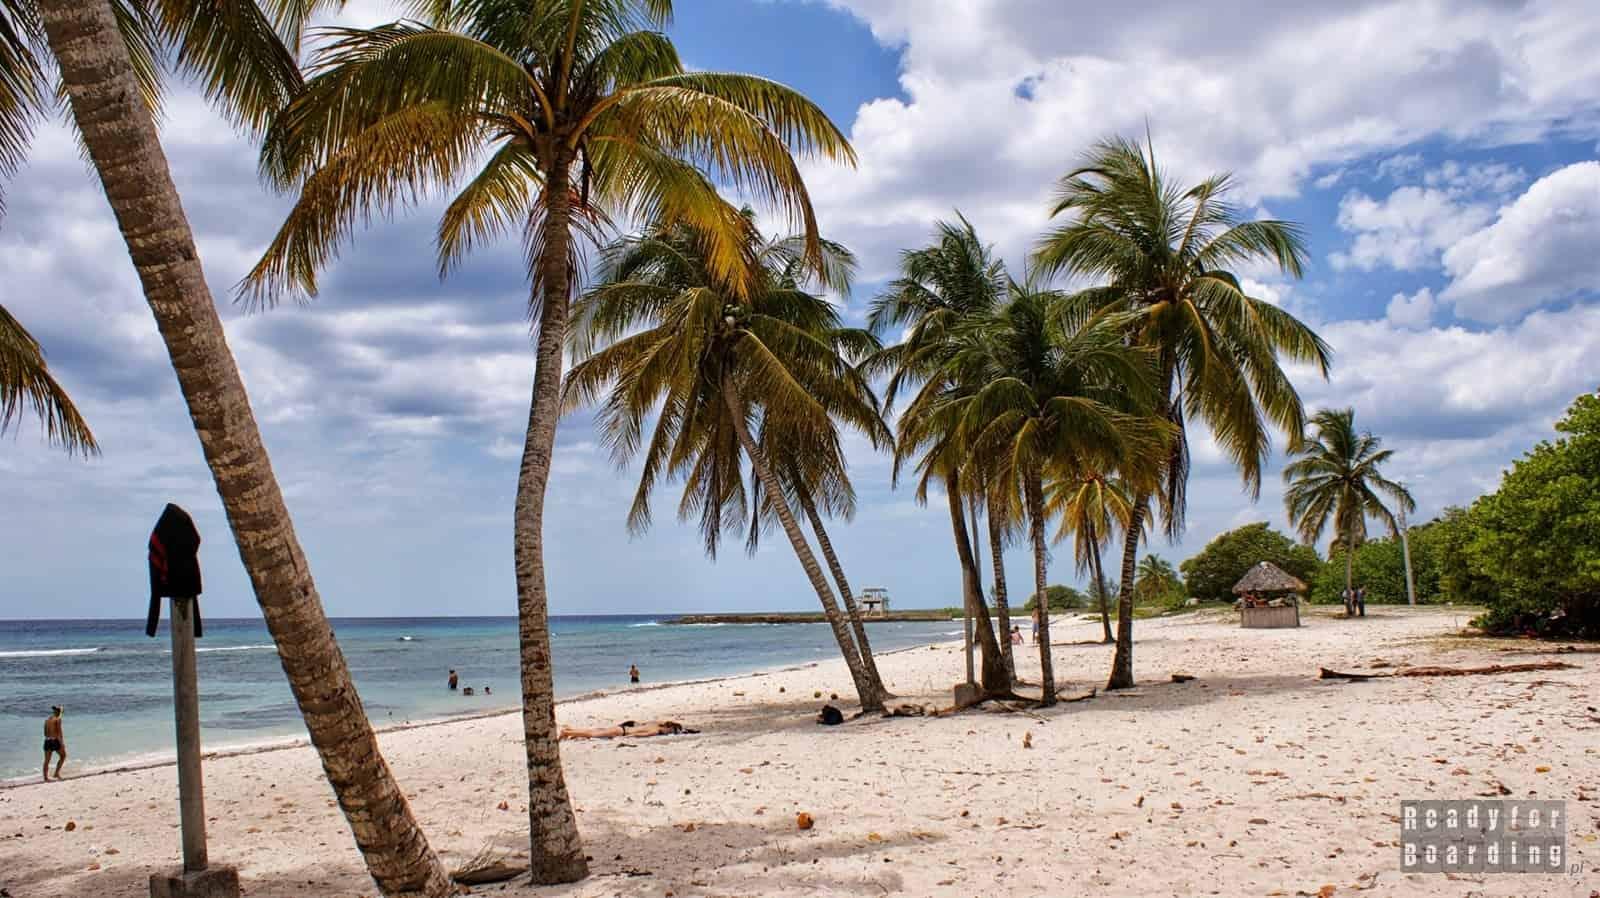 Kuba - Playa Larga & Playa Giron (galeria zdjęć)